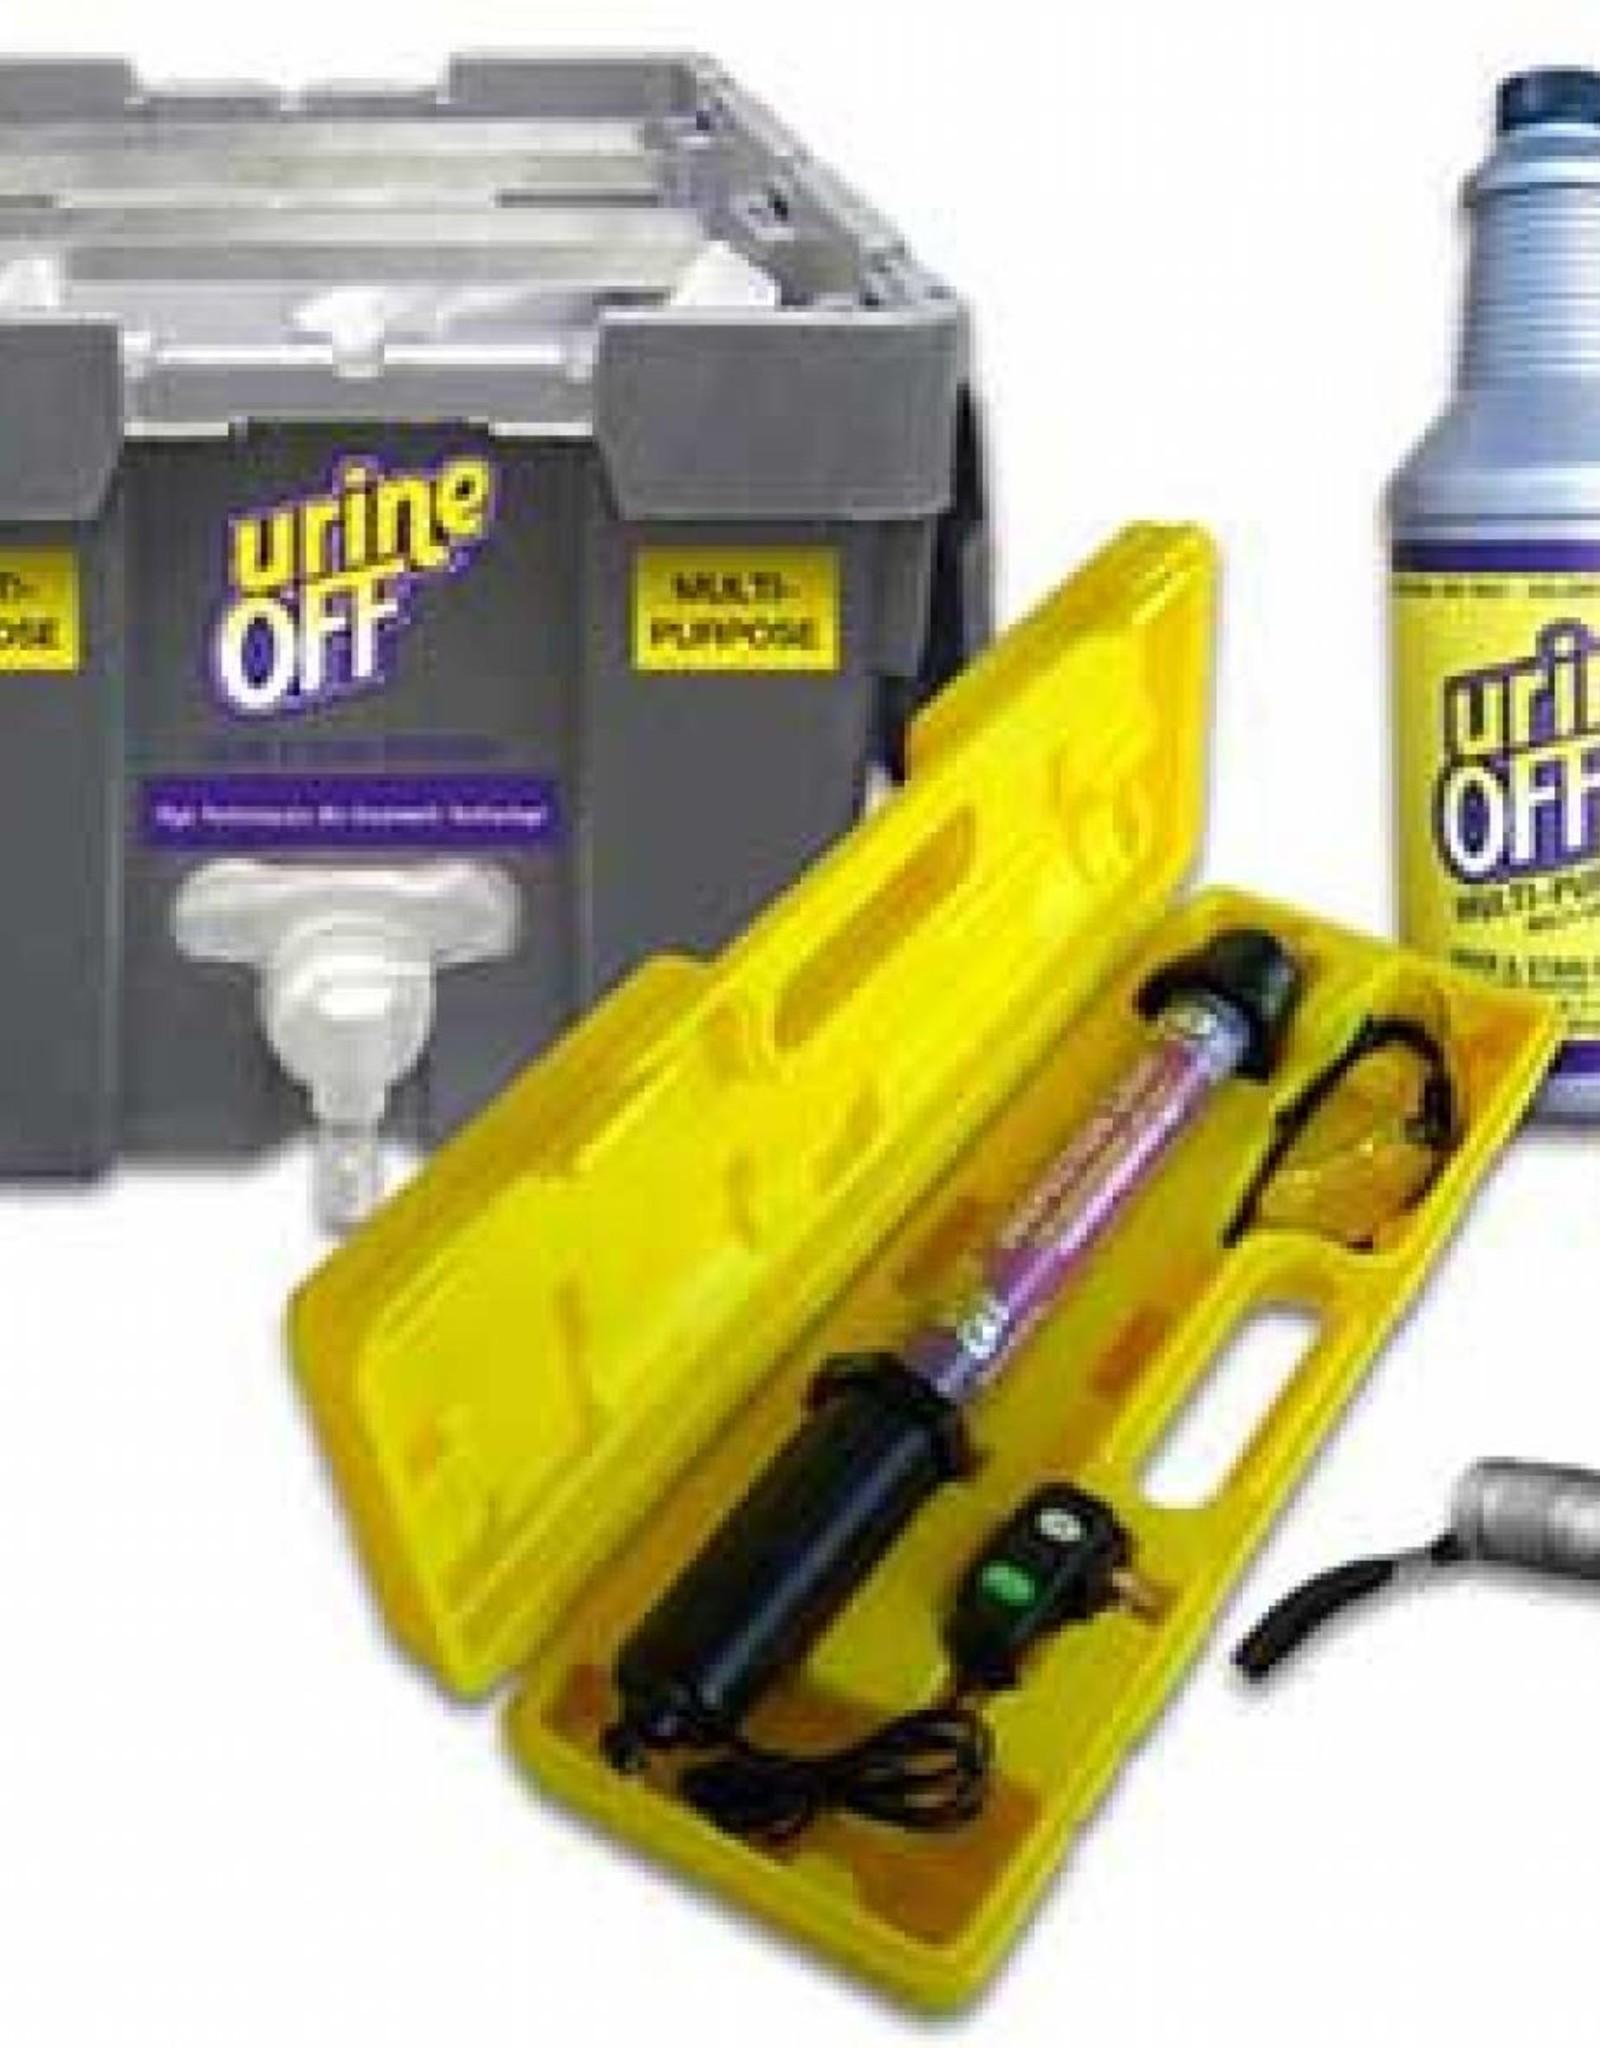 Urine Off - Multi Purpose - UrineOff Spray 1 Litre